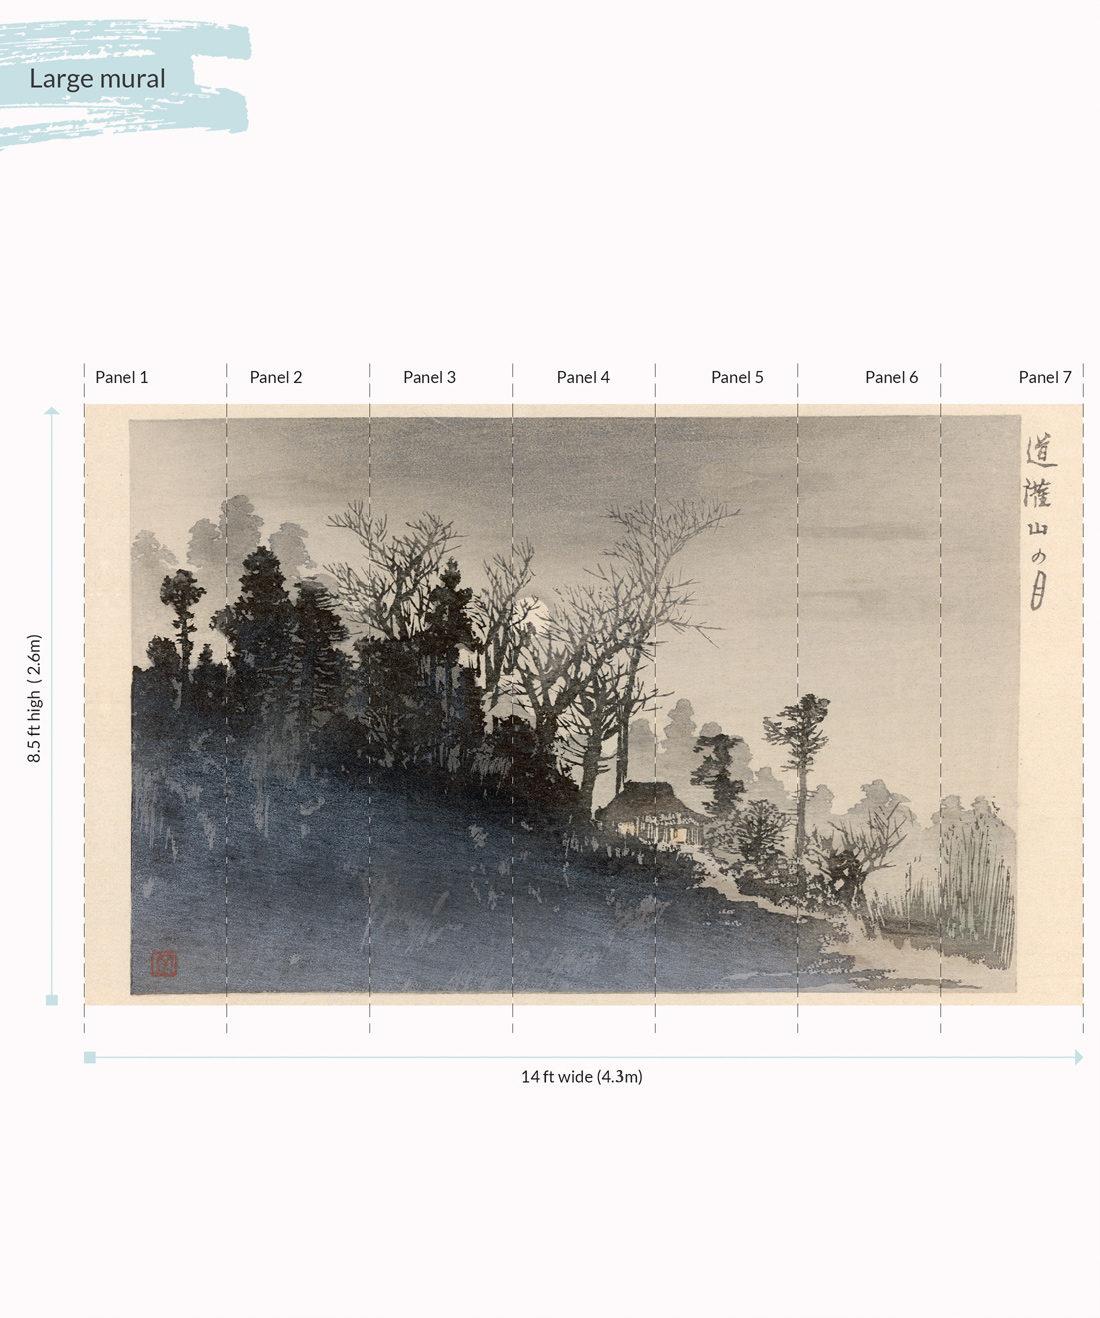 Mt Tsukuba Mist Wall Mural - Large